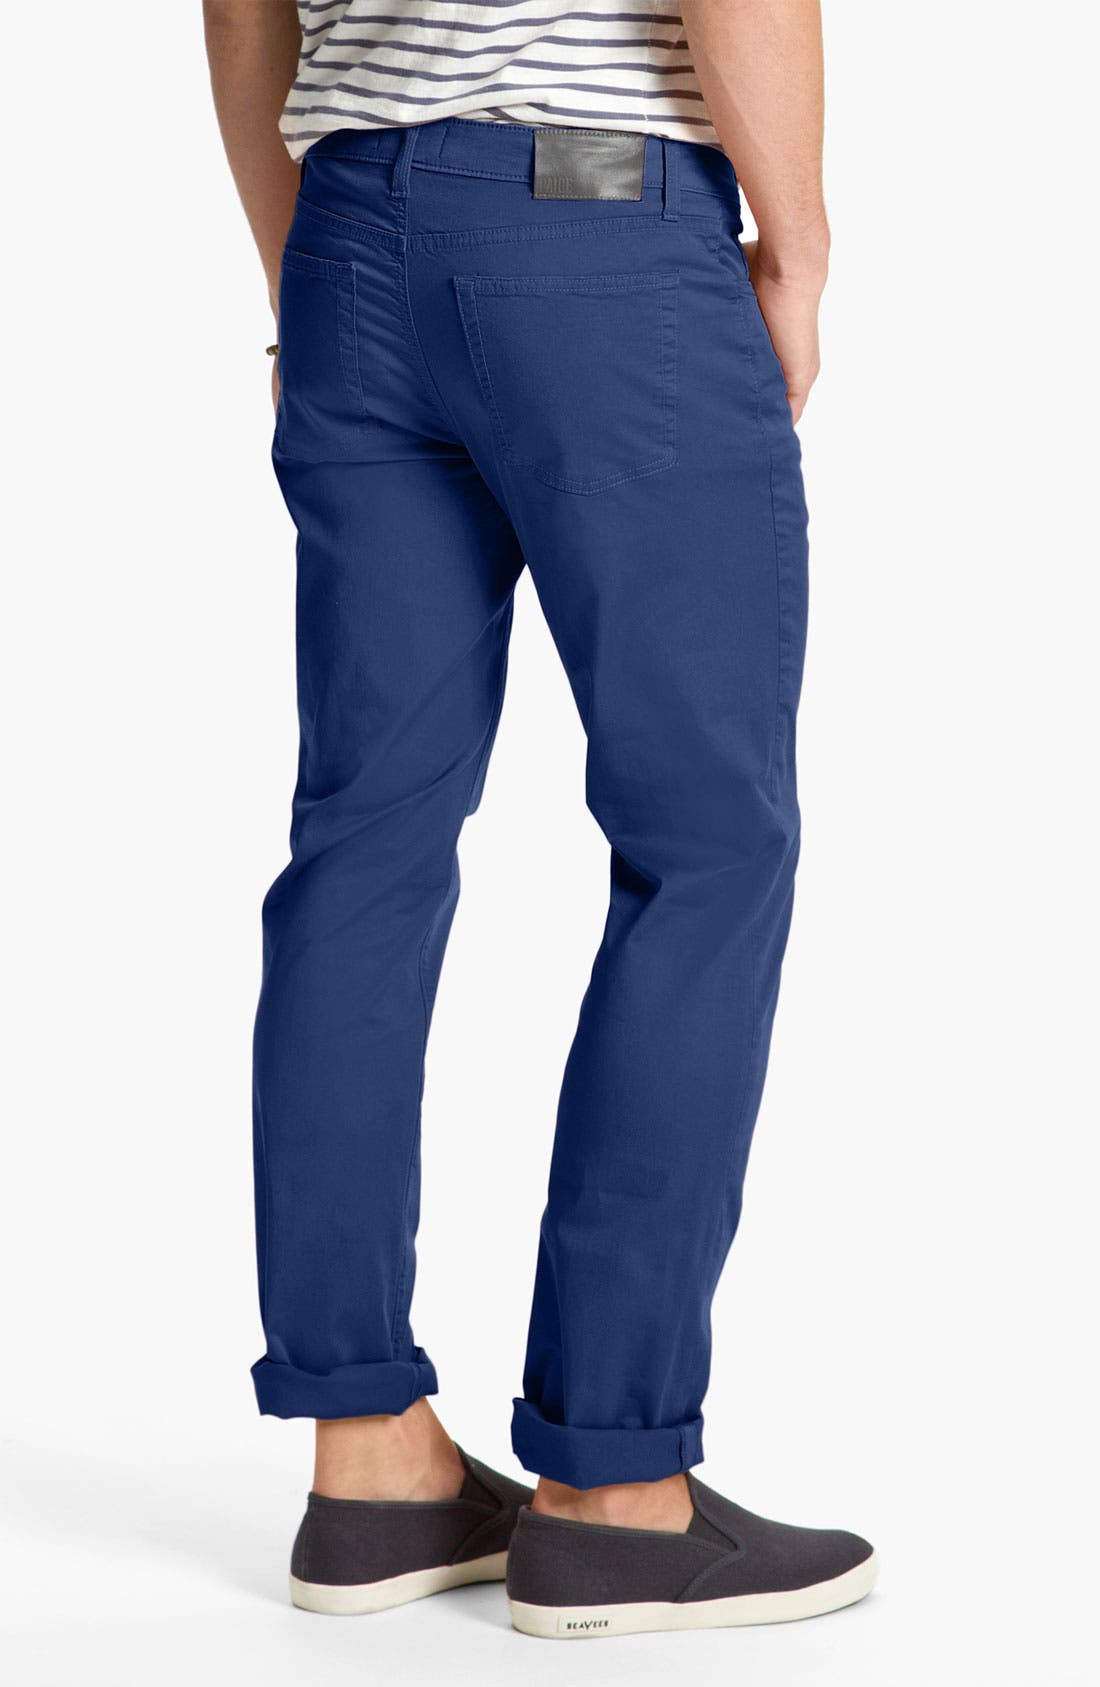 Alternate Image 1 Selected - PAIGE 'Normandie' Slim Straight Leg Pants